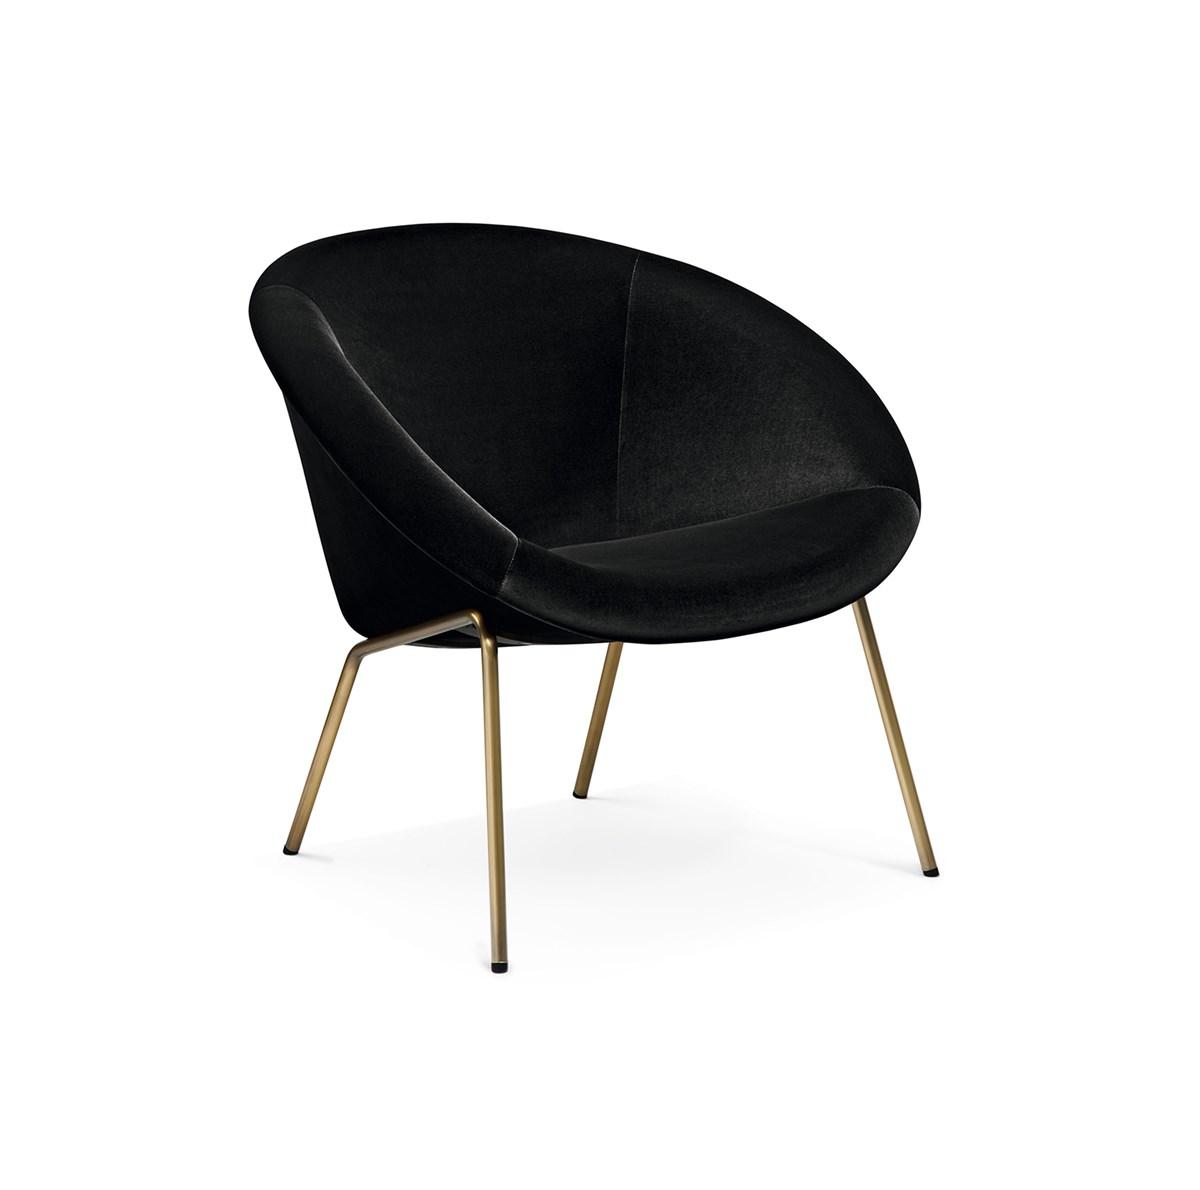 Walter-Knoll-Walter-Knoll-Team-369-Armchair-Matisse-1